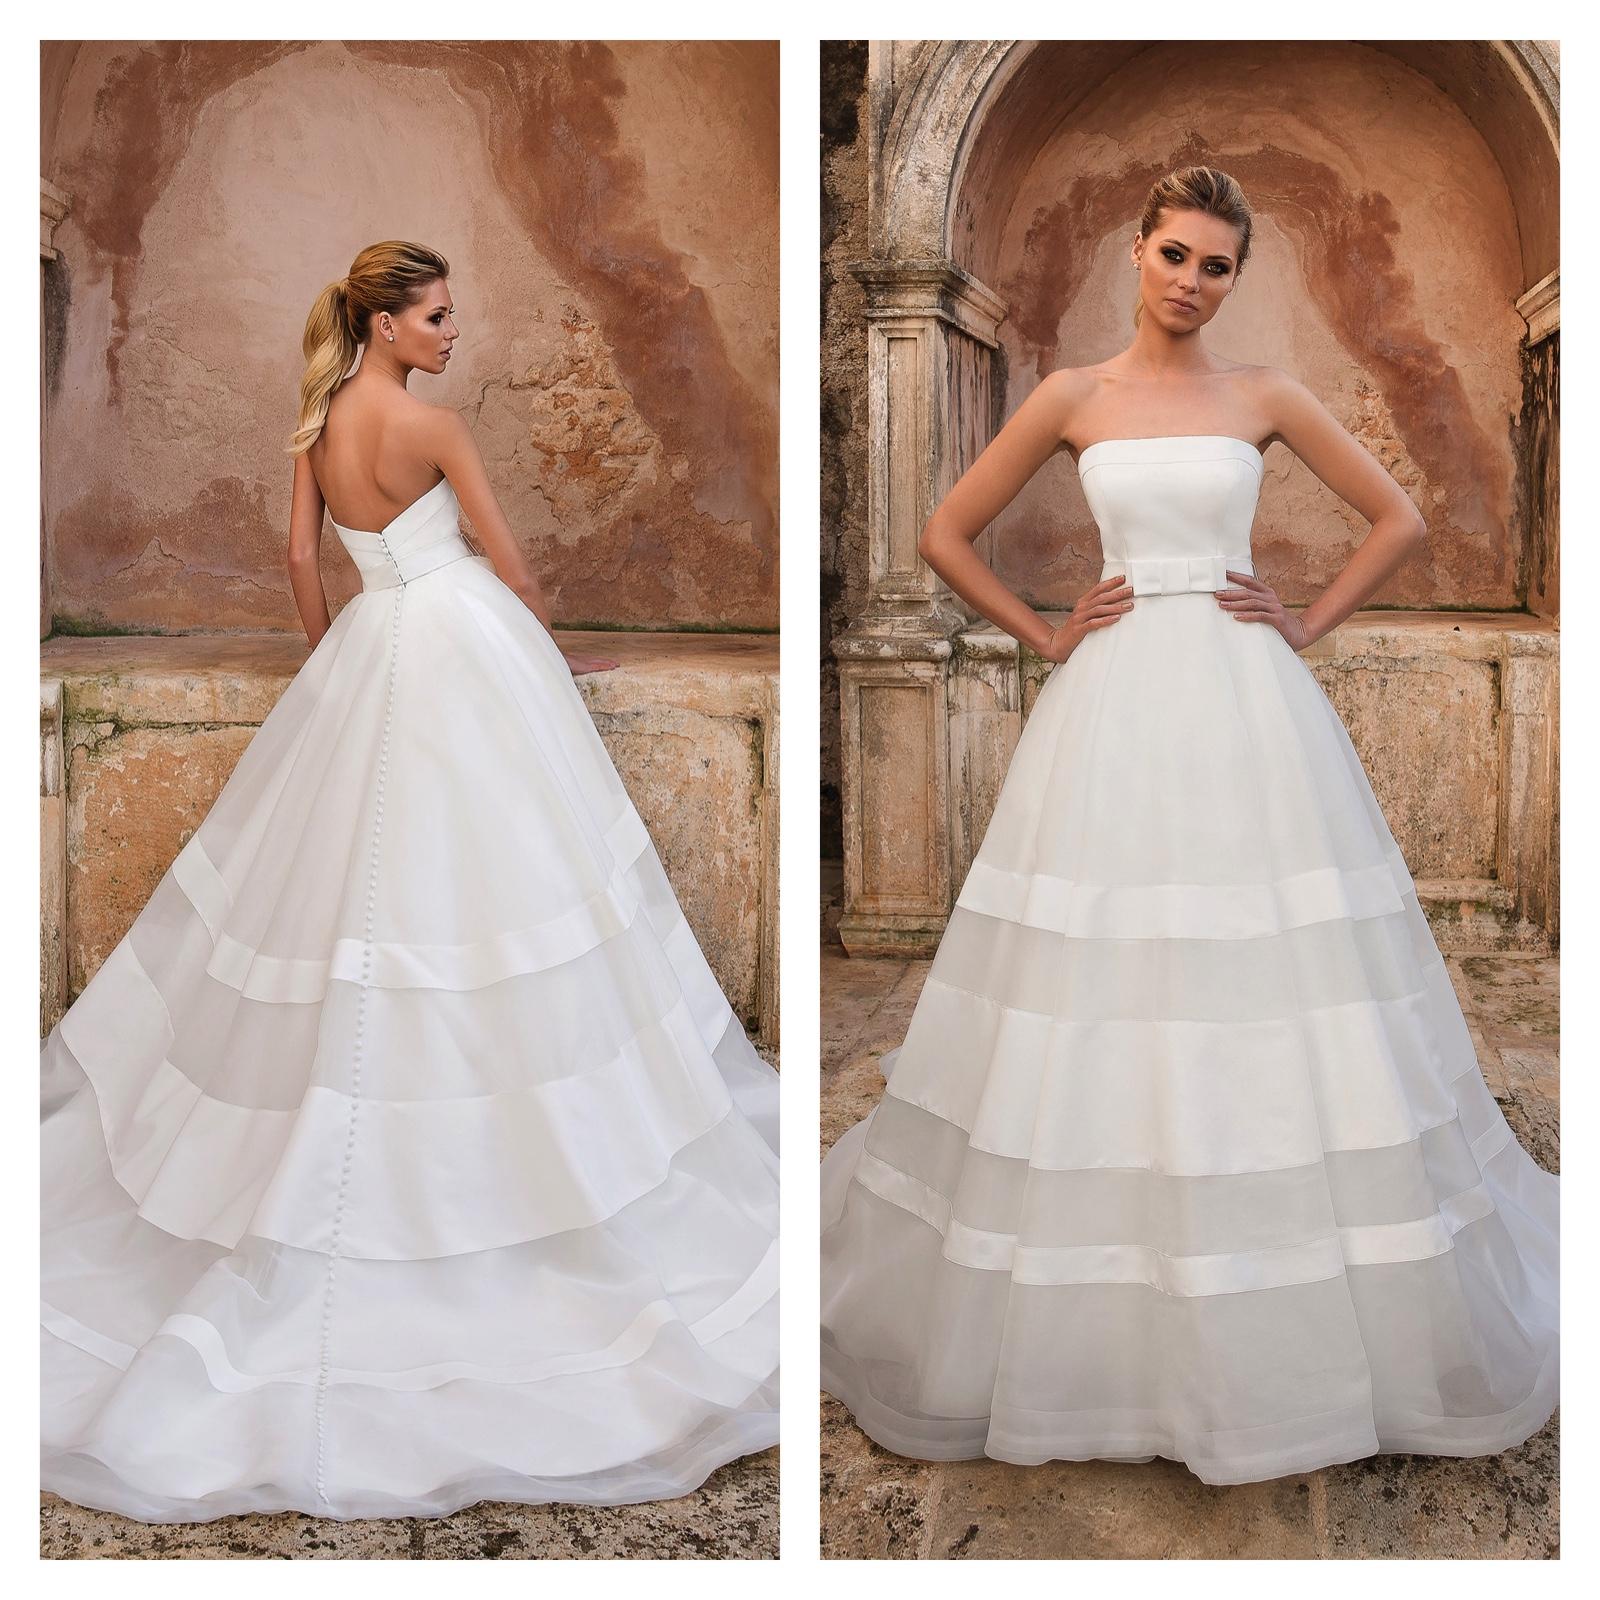 Justin Alexander White Wedding Dress